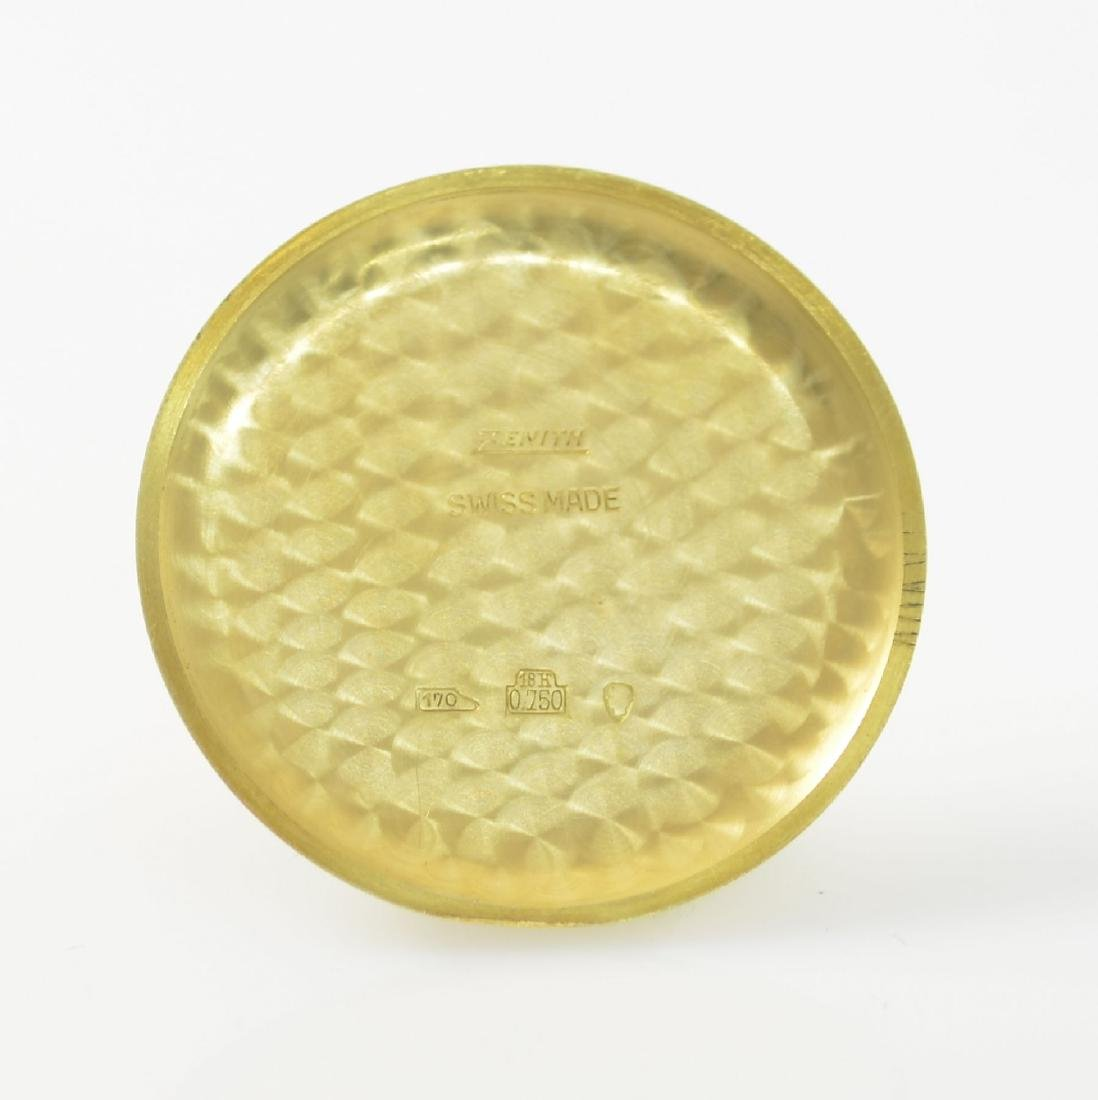 ZENITH oversized 18k yellow gold gents wristwatch - 9